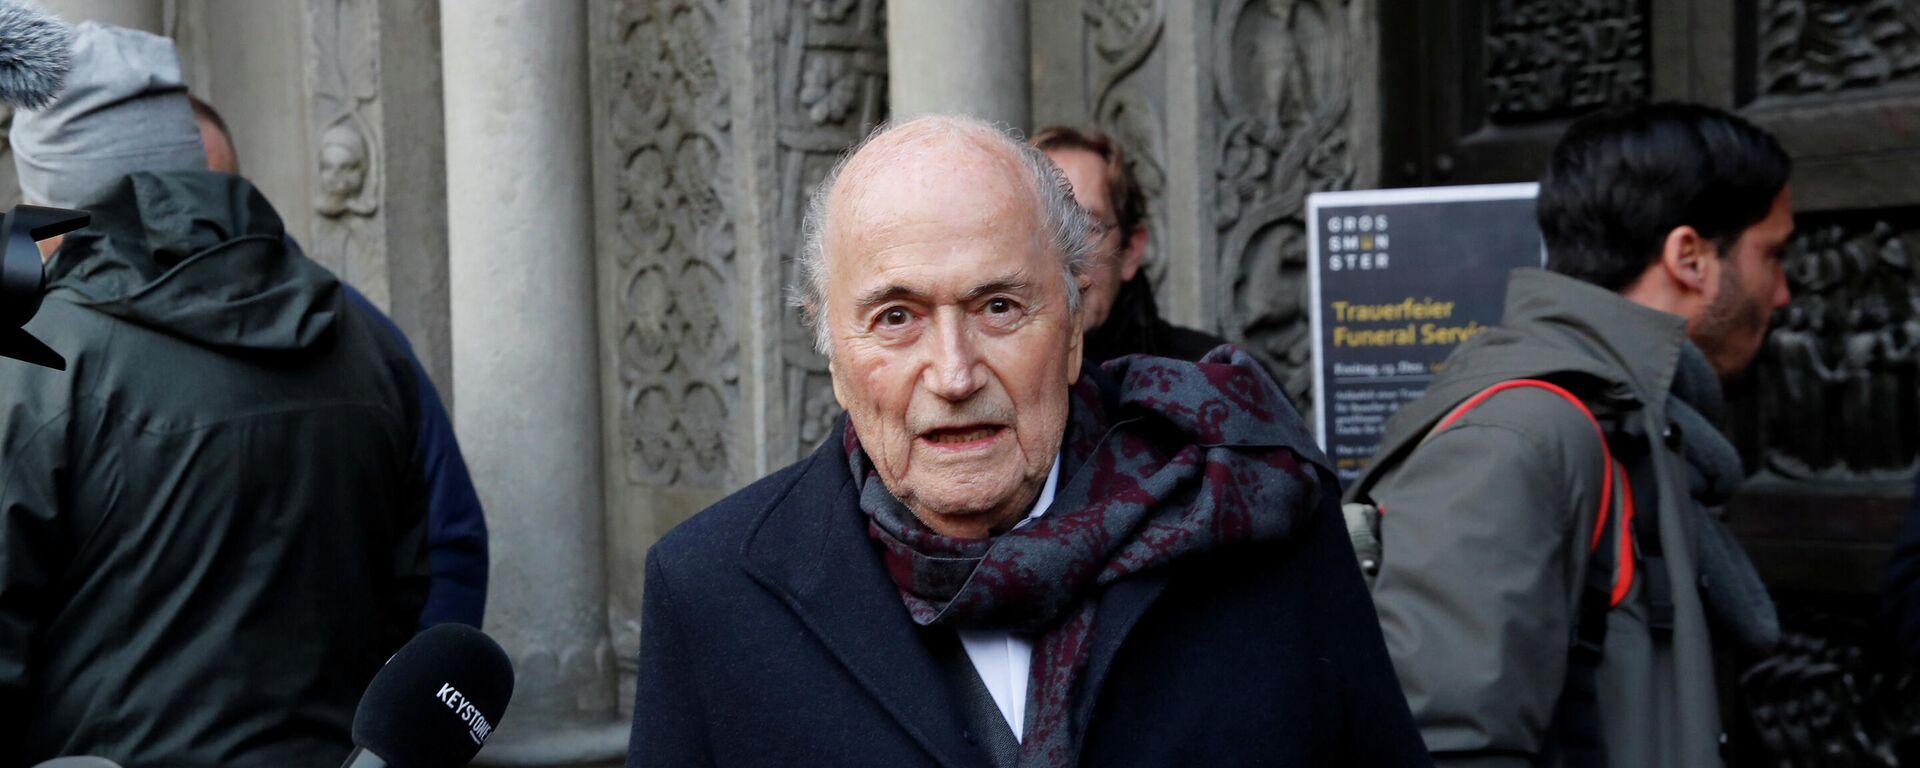 Joseph Blatter, expresidente de la Federación Internacional de Fútbol (FIFA) - Sputnik Mundo, 1920, 24.03.2021